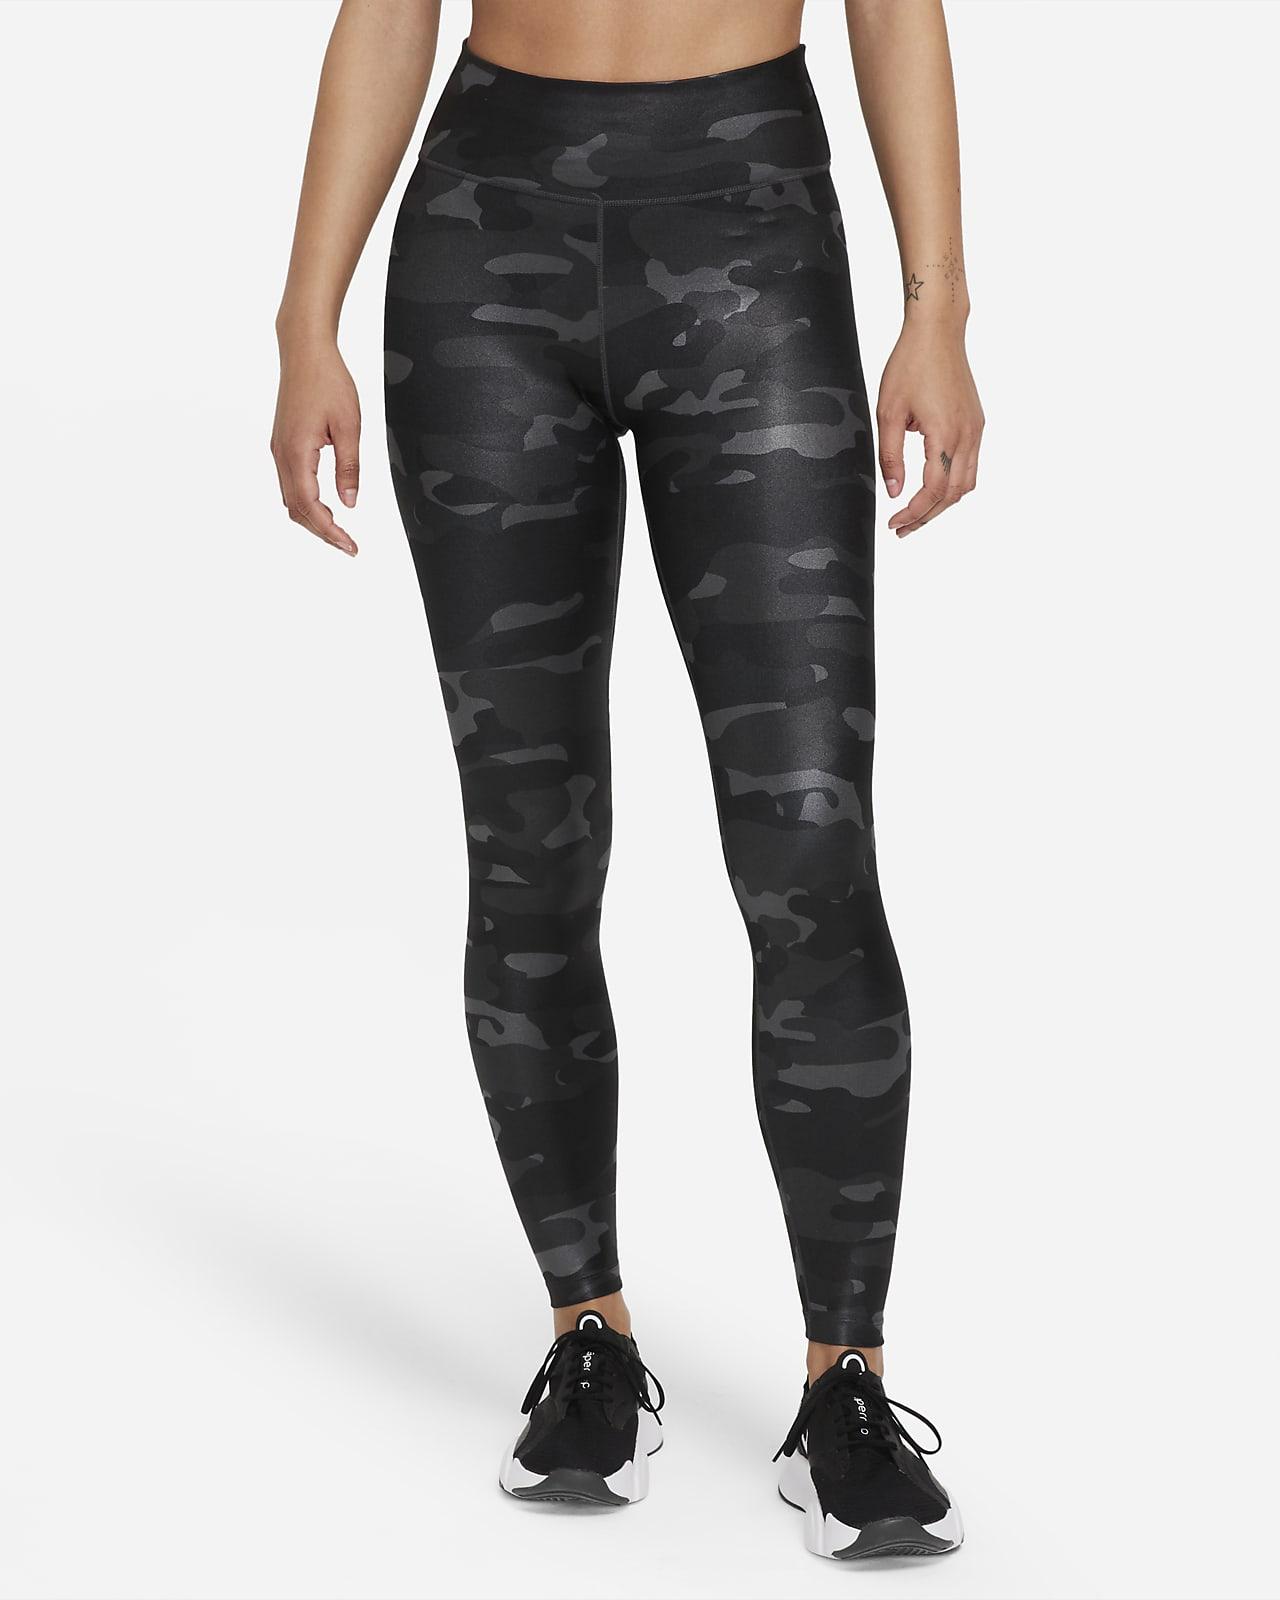 Nike Dri-FIT One Leggings de camuflaje de talle medio - Mujer